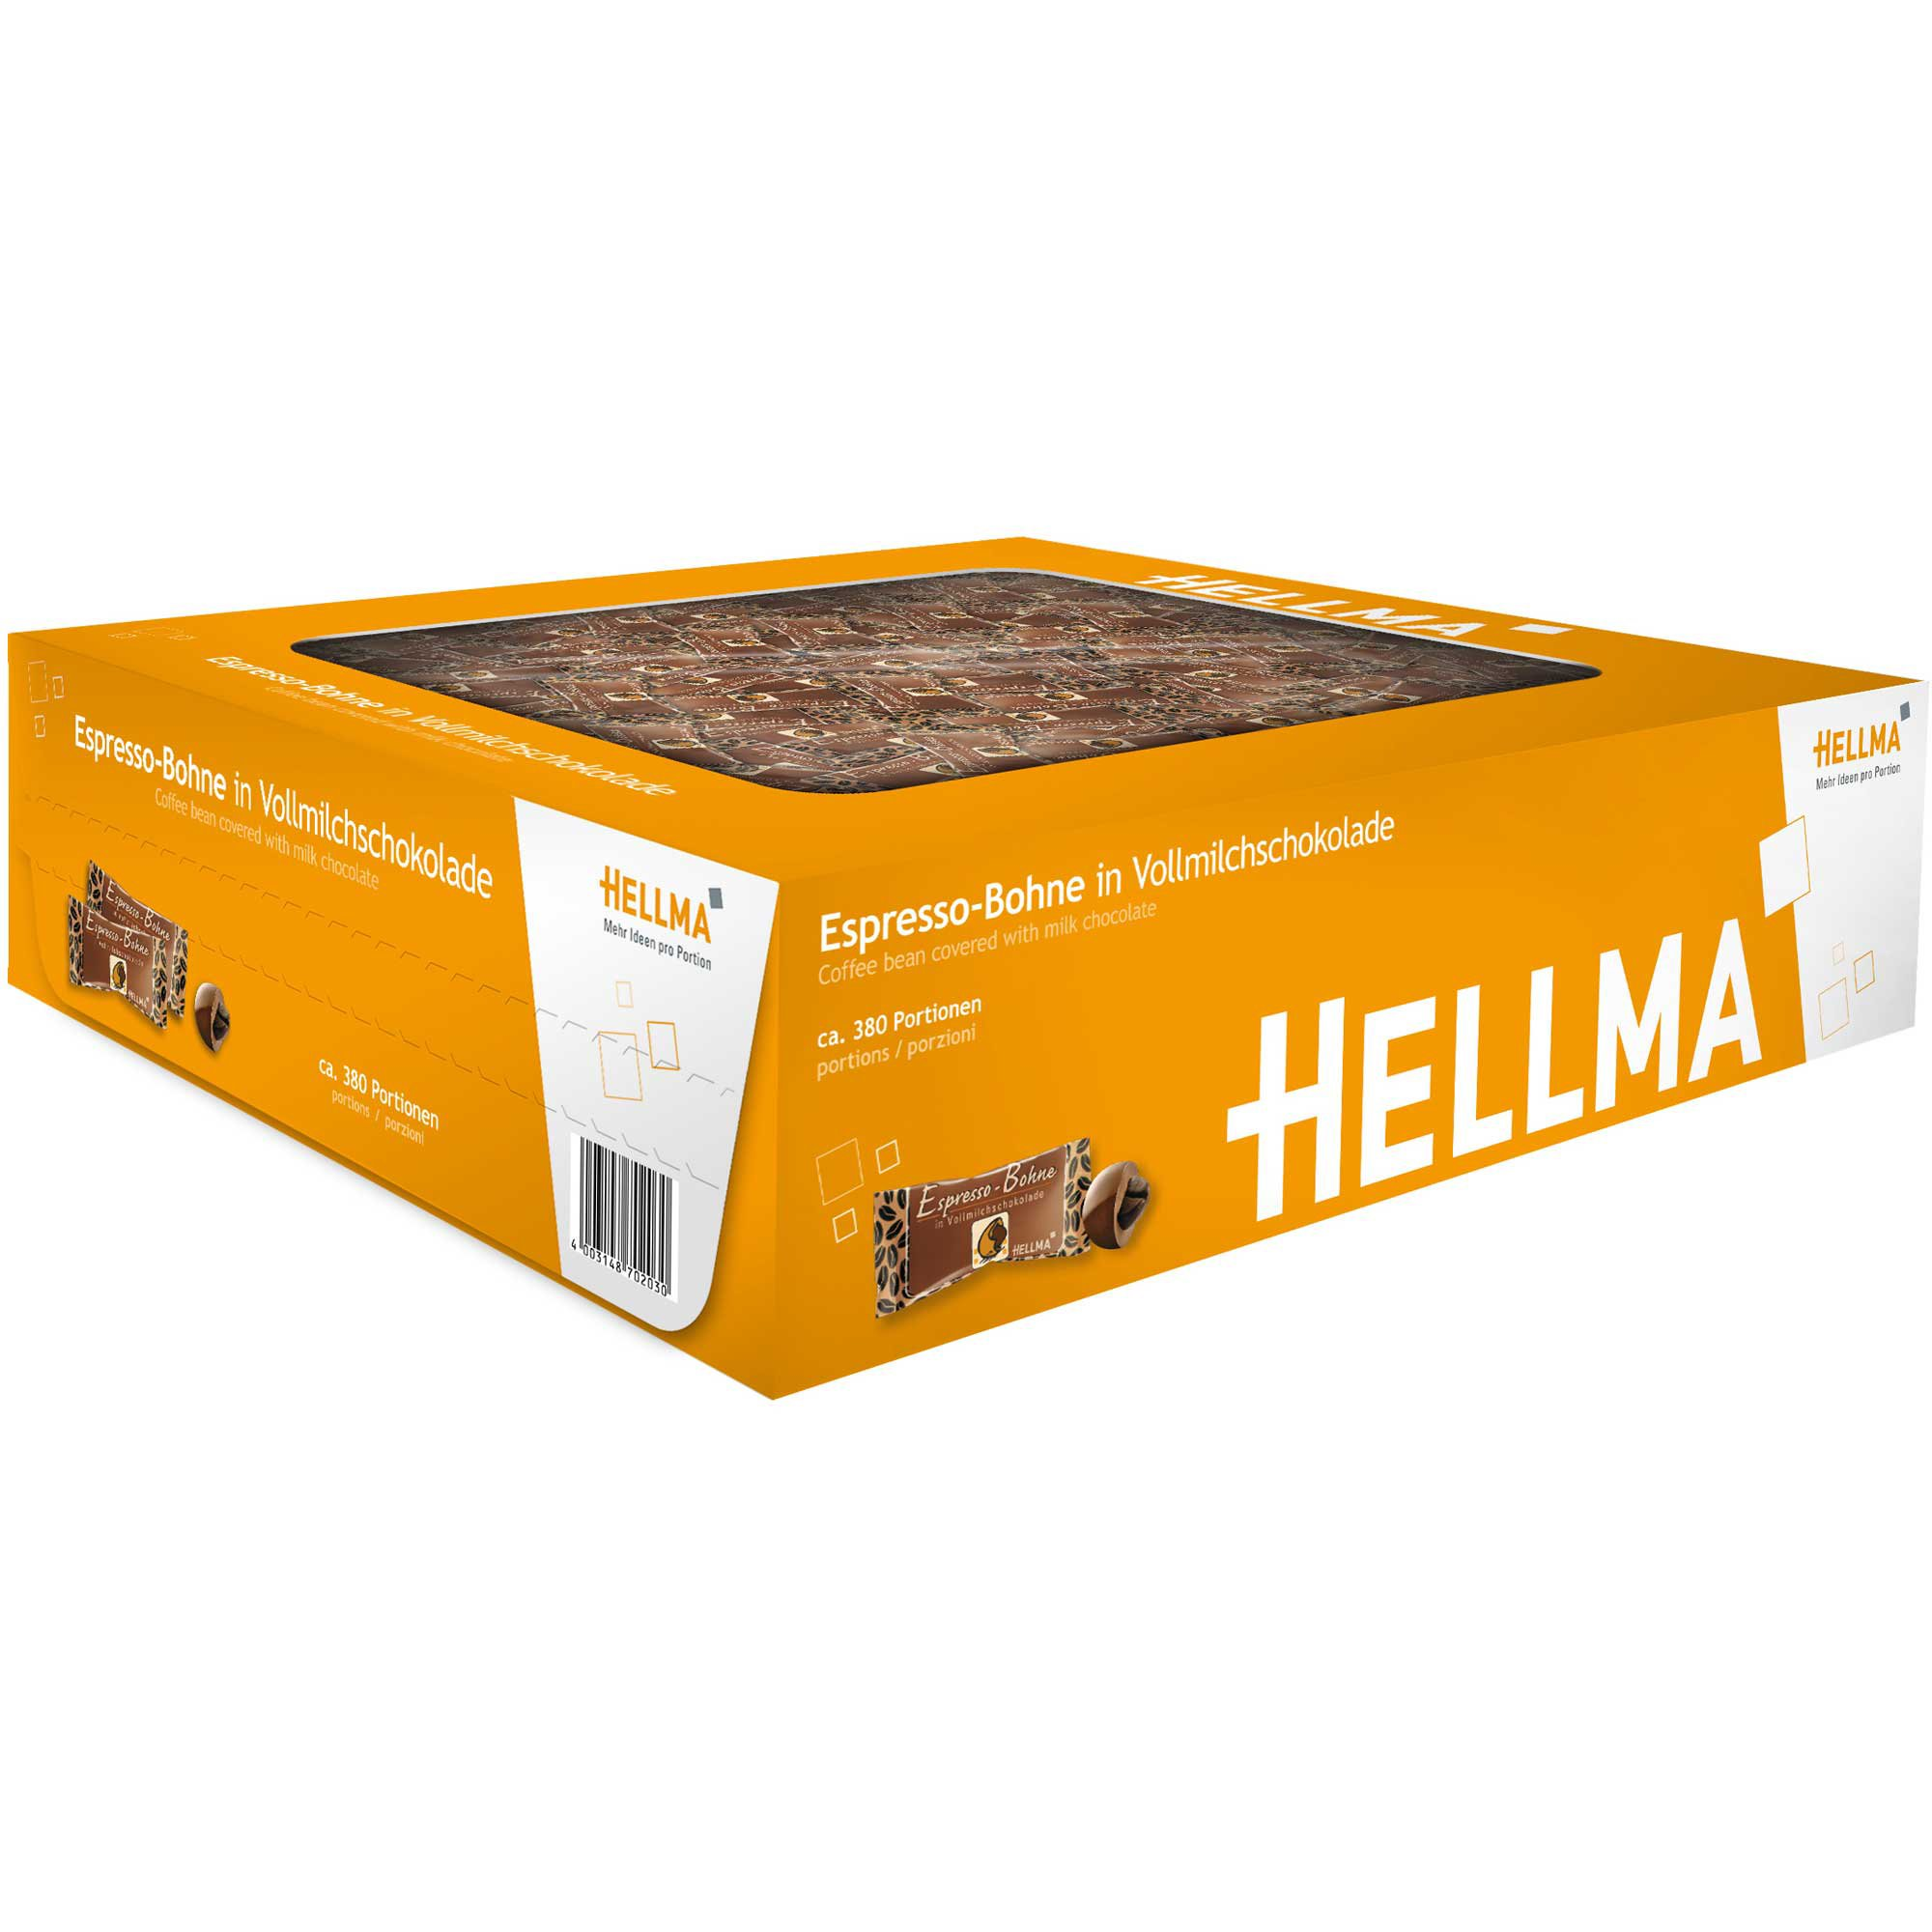 Hellma espresso bean in full milk chocolate 380 Pieces (418g)